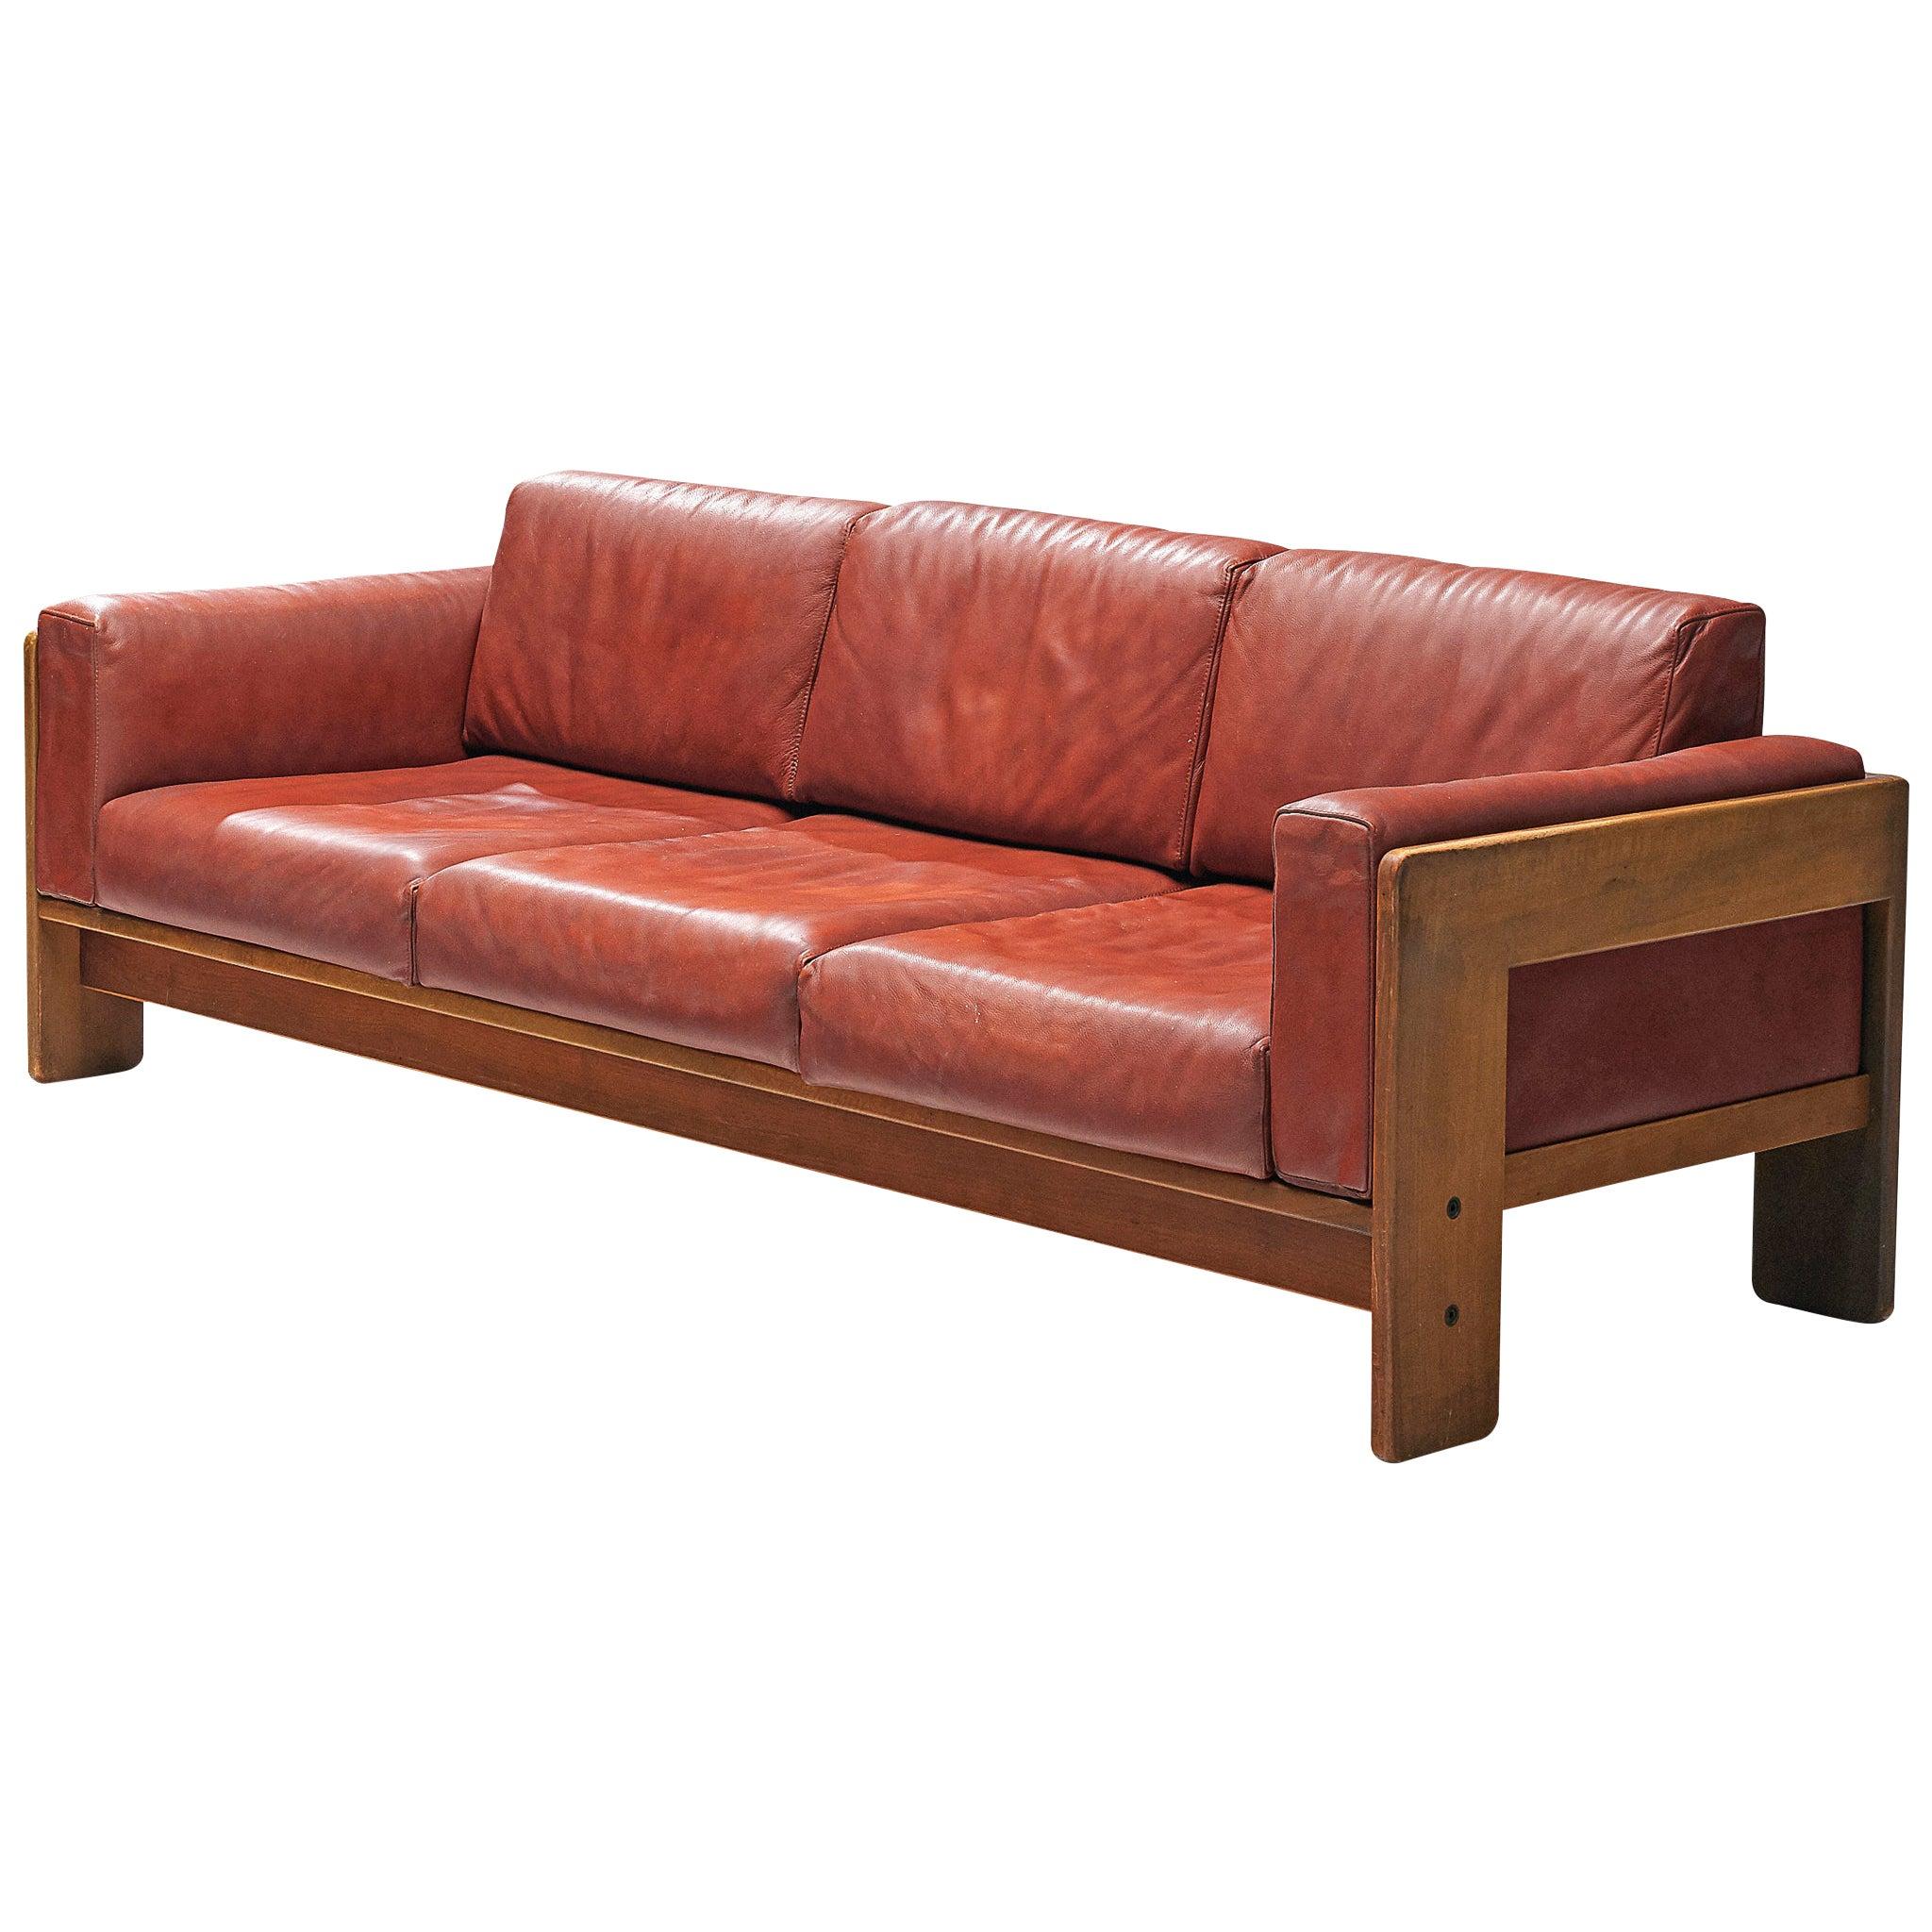 Tobia Scarpa Bastiano Sofa in Leather